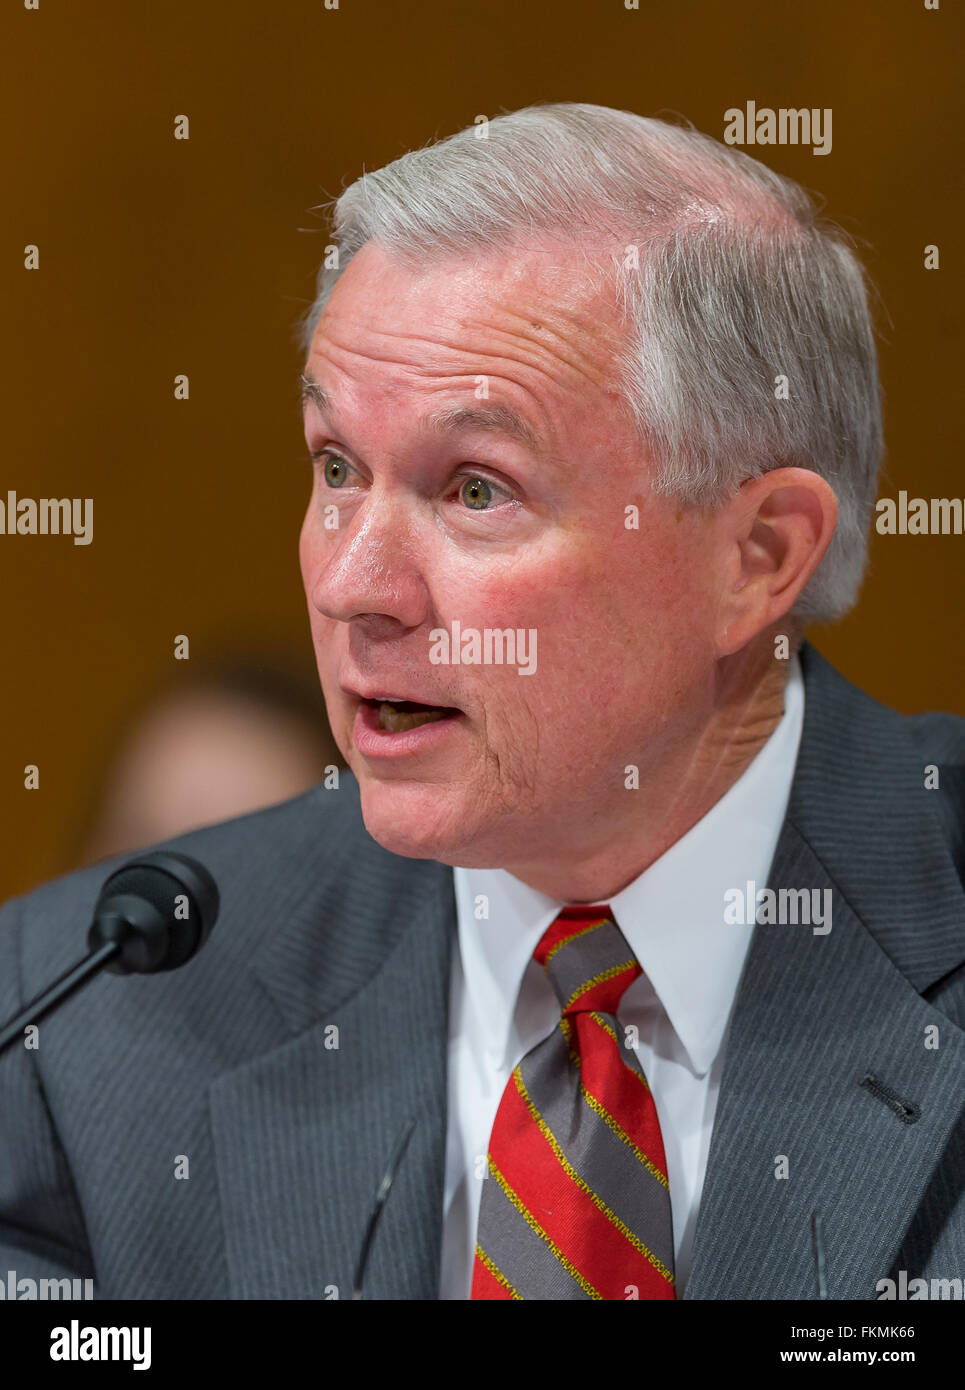 WASHINGTON, DC, USA - U. S. Senator Jeff Sessions (R-AL) - Stock Image